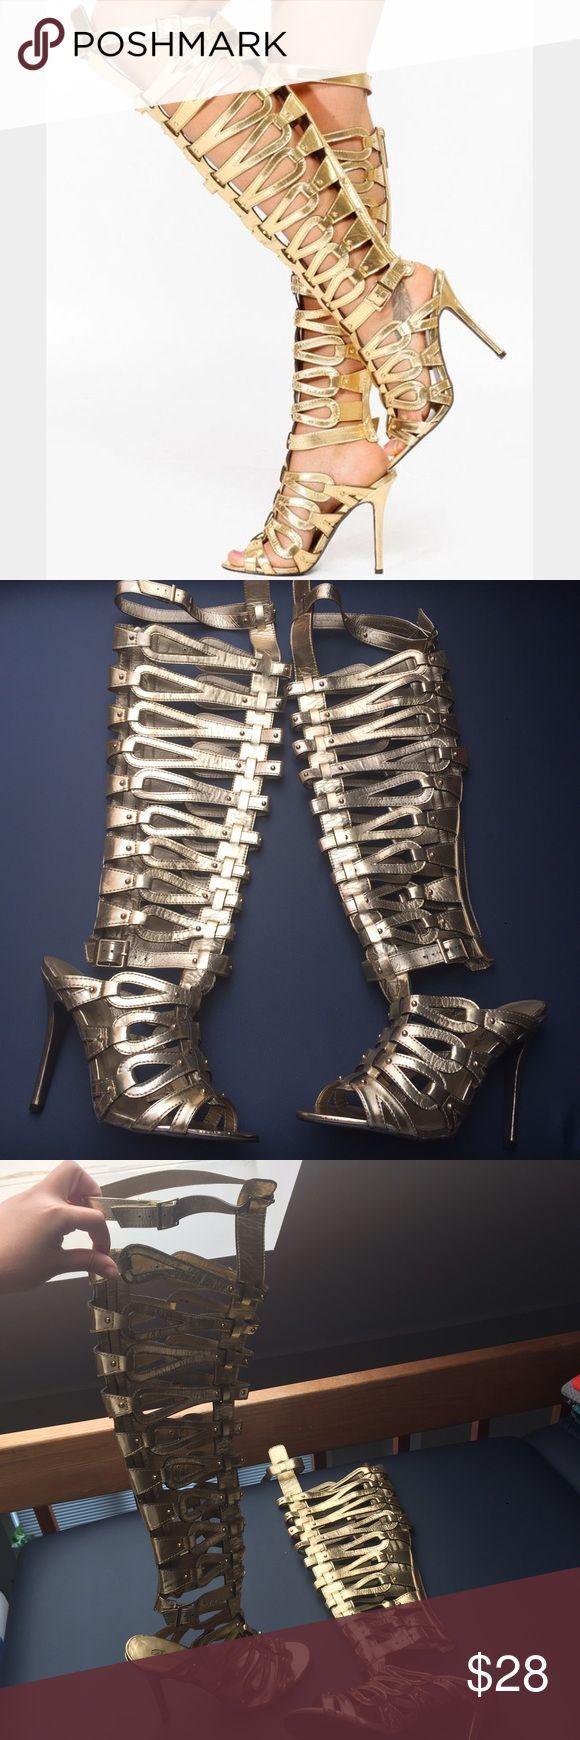 The 25+ best Thigh high gladiator heels ideas on Pinterest ...